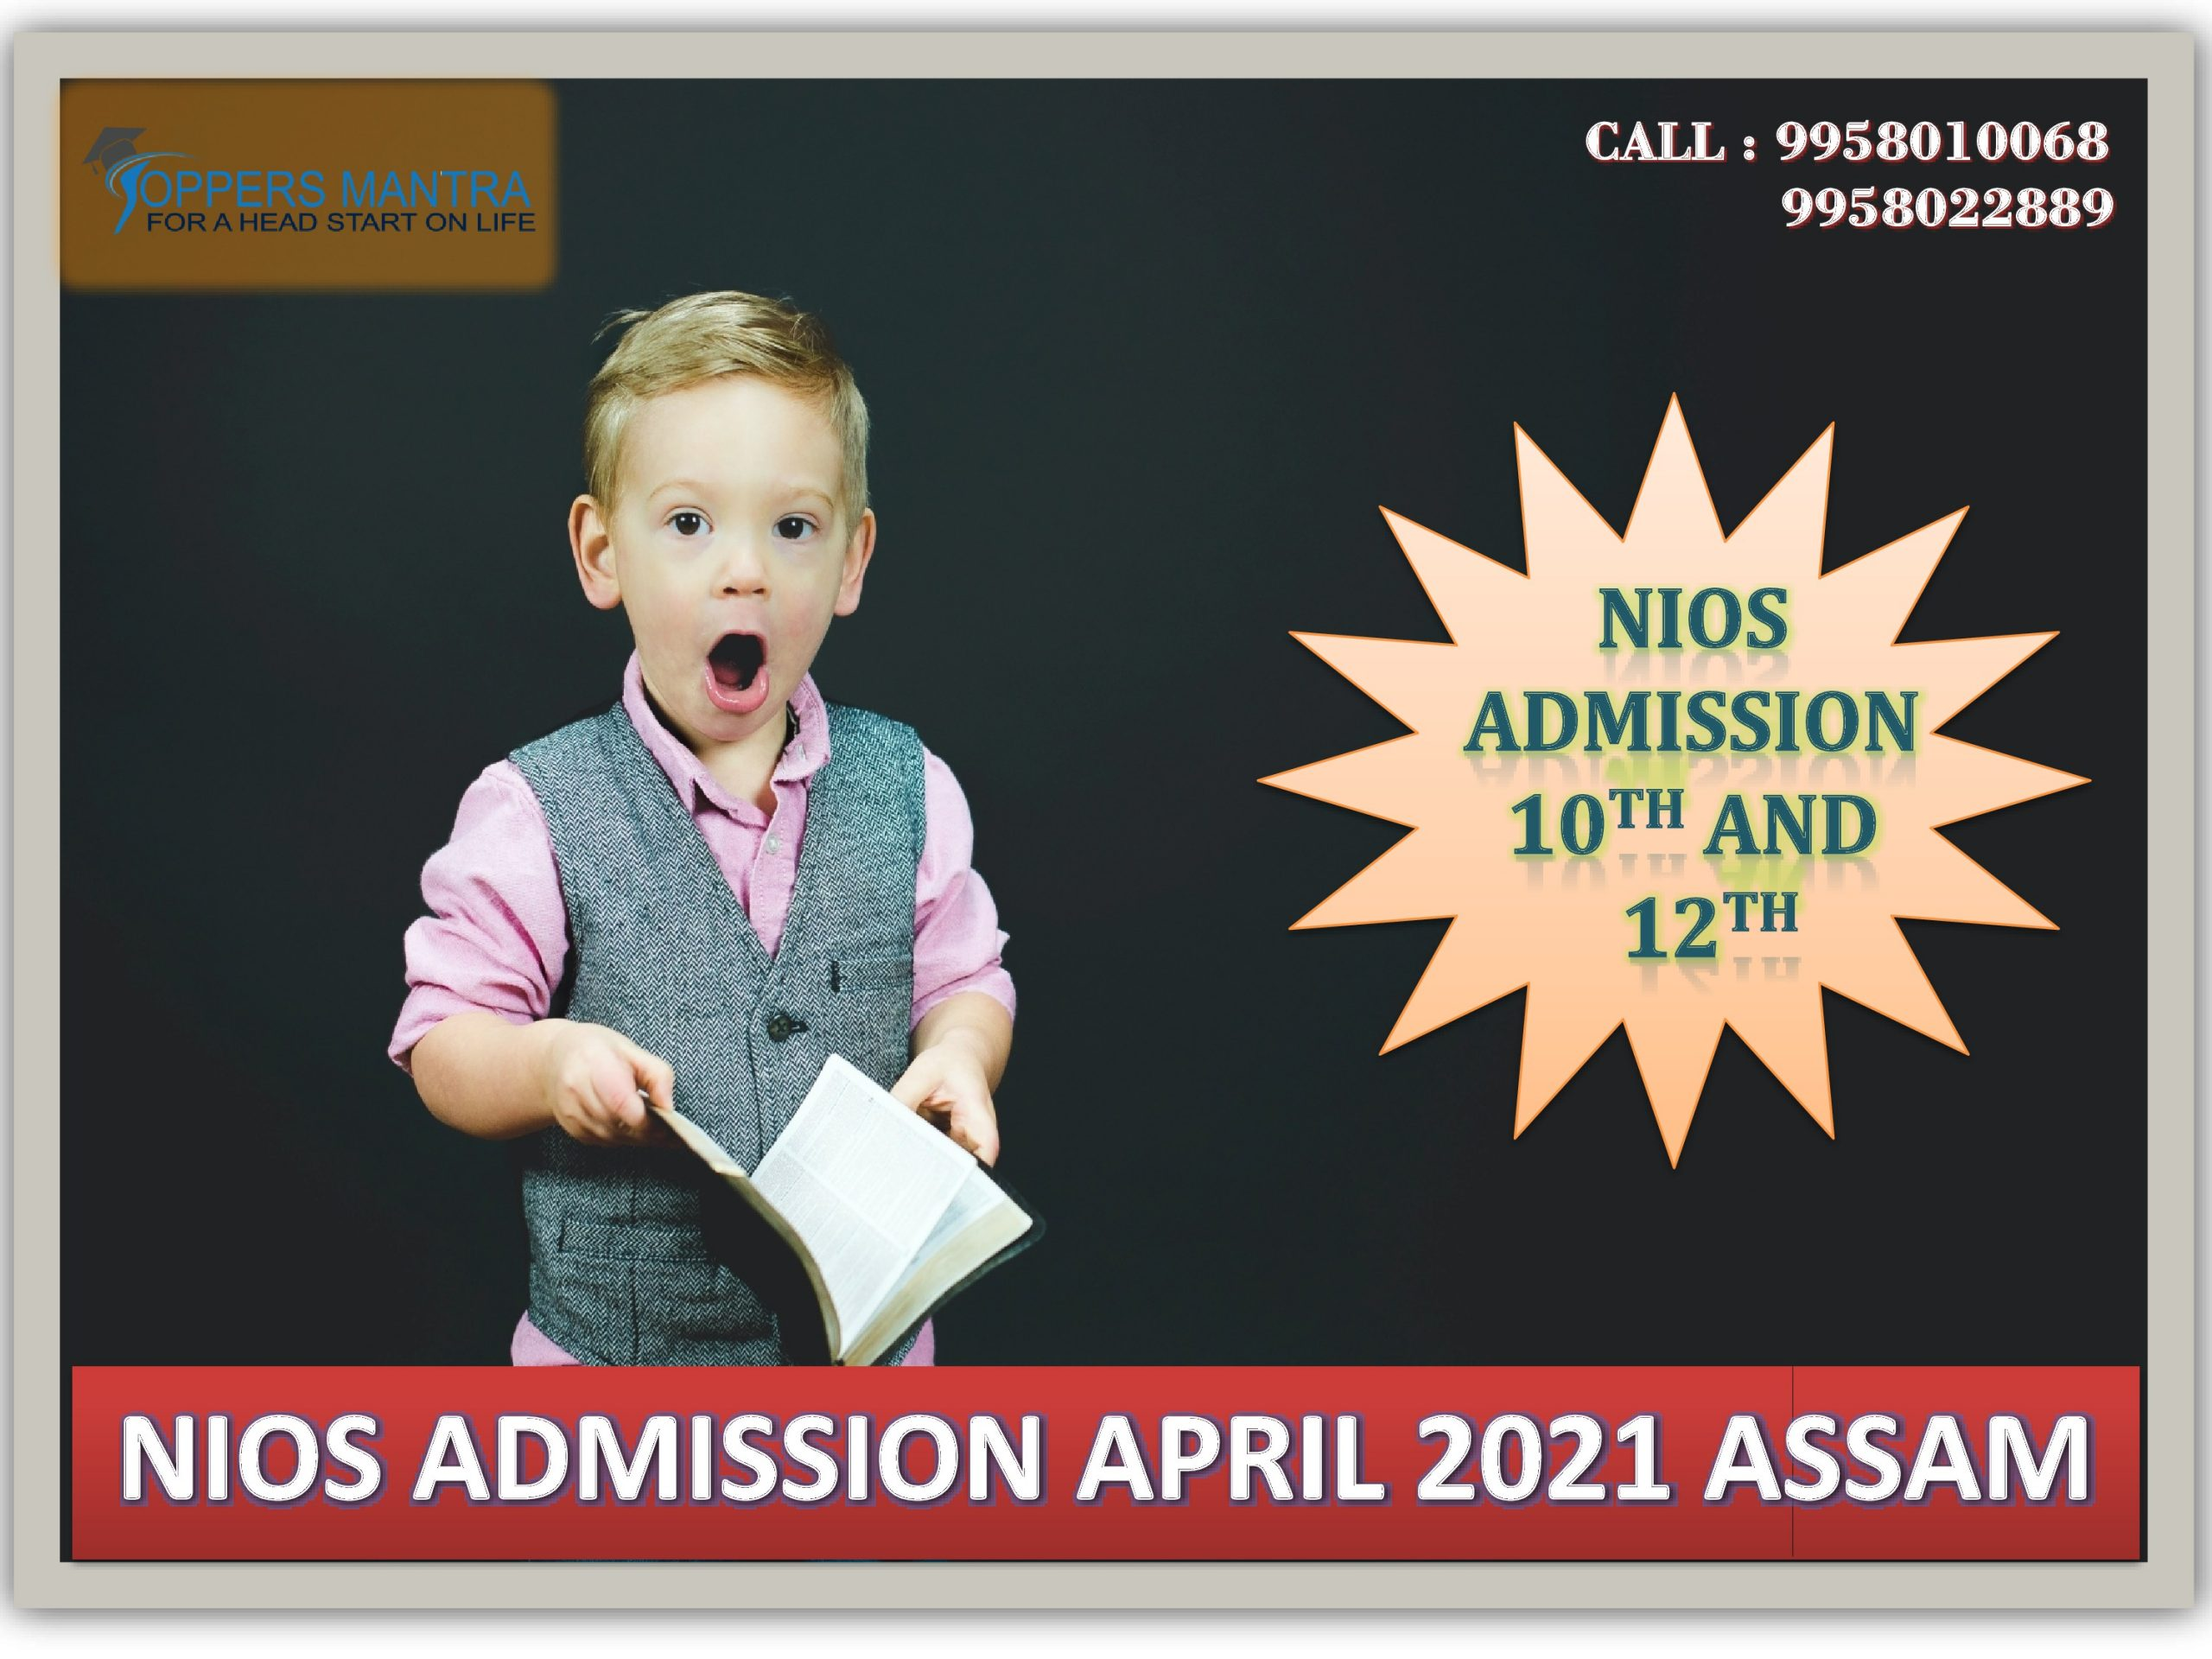 Nios-Admission-Assam-Guwahati-Sonitpur-Toppers-Mantra-10th 12th